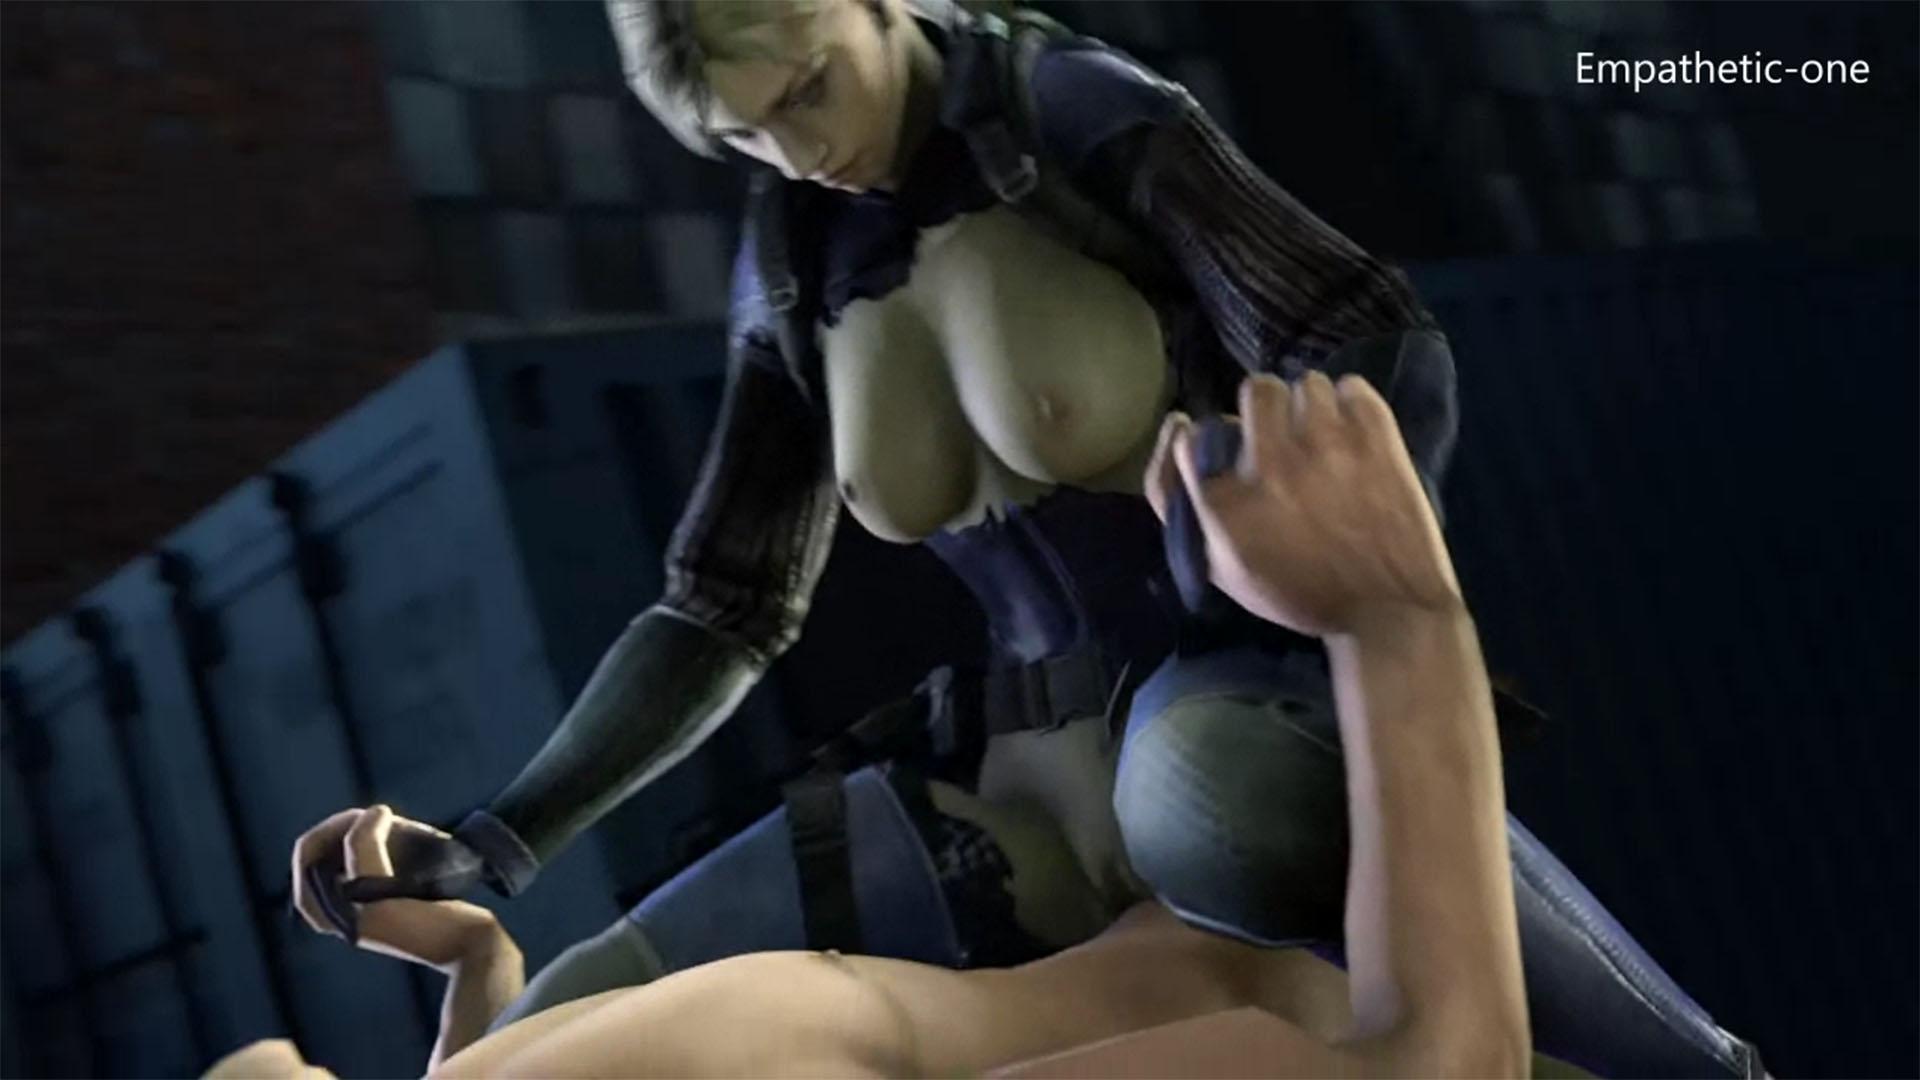 Cock strap safe